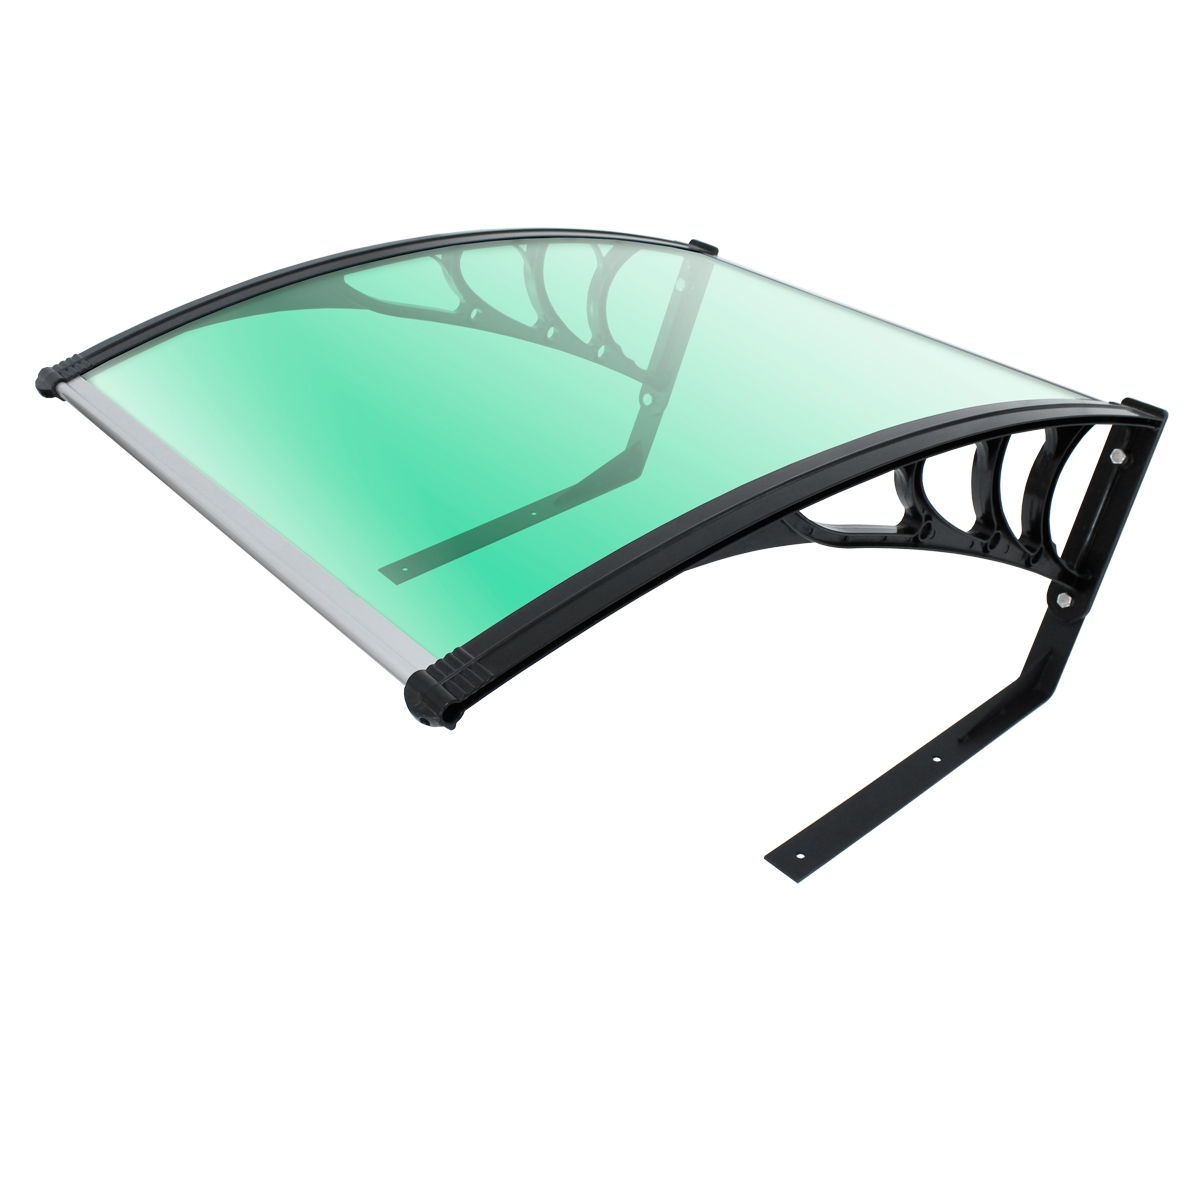 black green color robotic lawnmower roof protective garage roof for car mower ebay. Black Bedroom Furniture Sets. Home Design Ideas